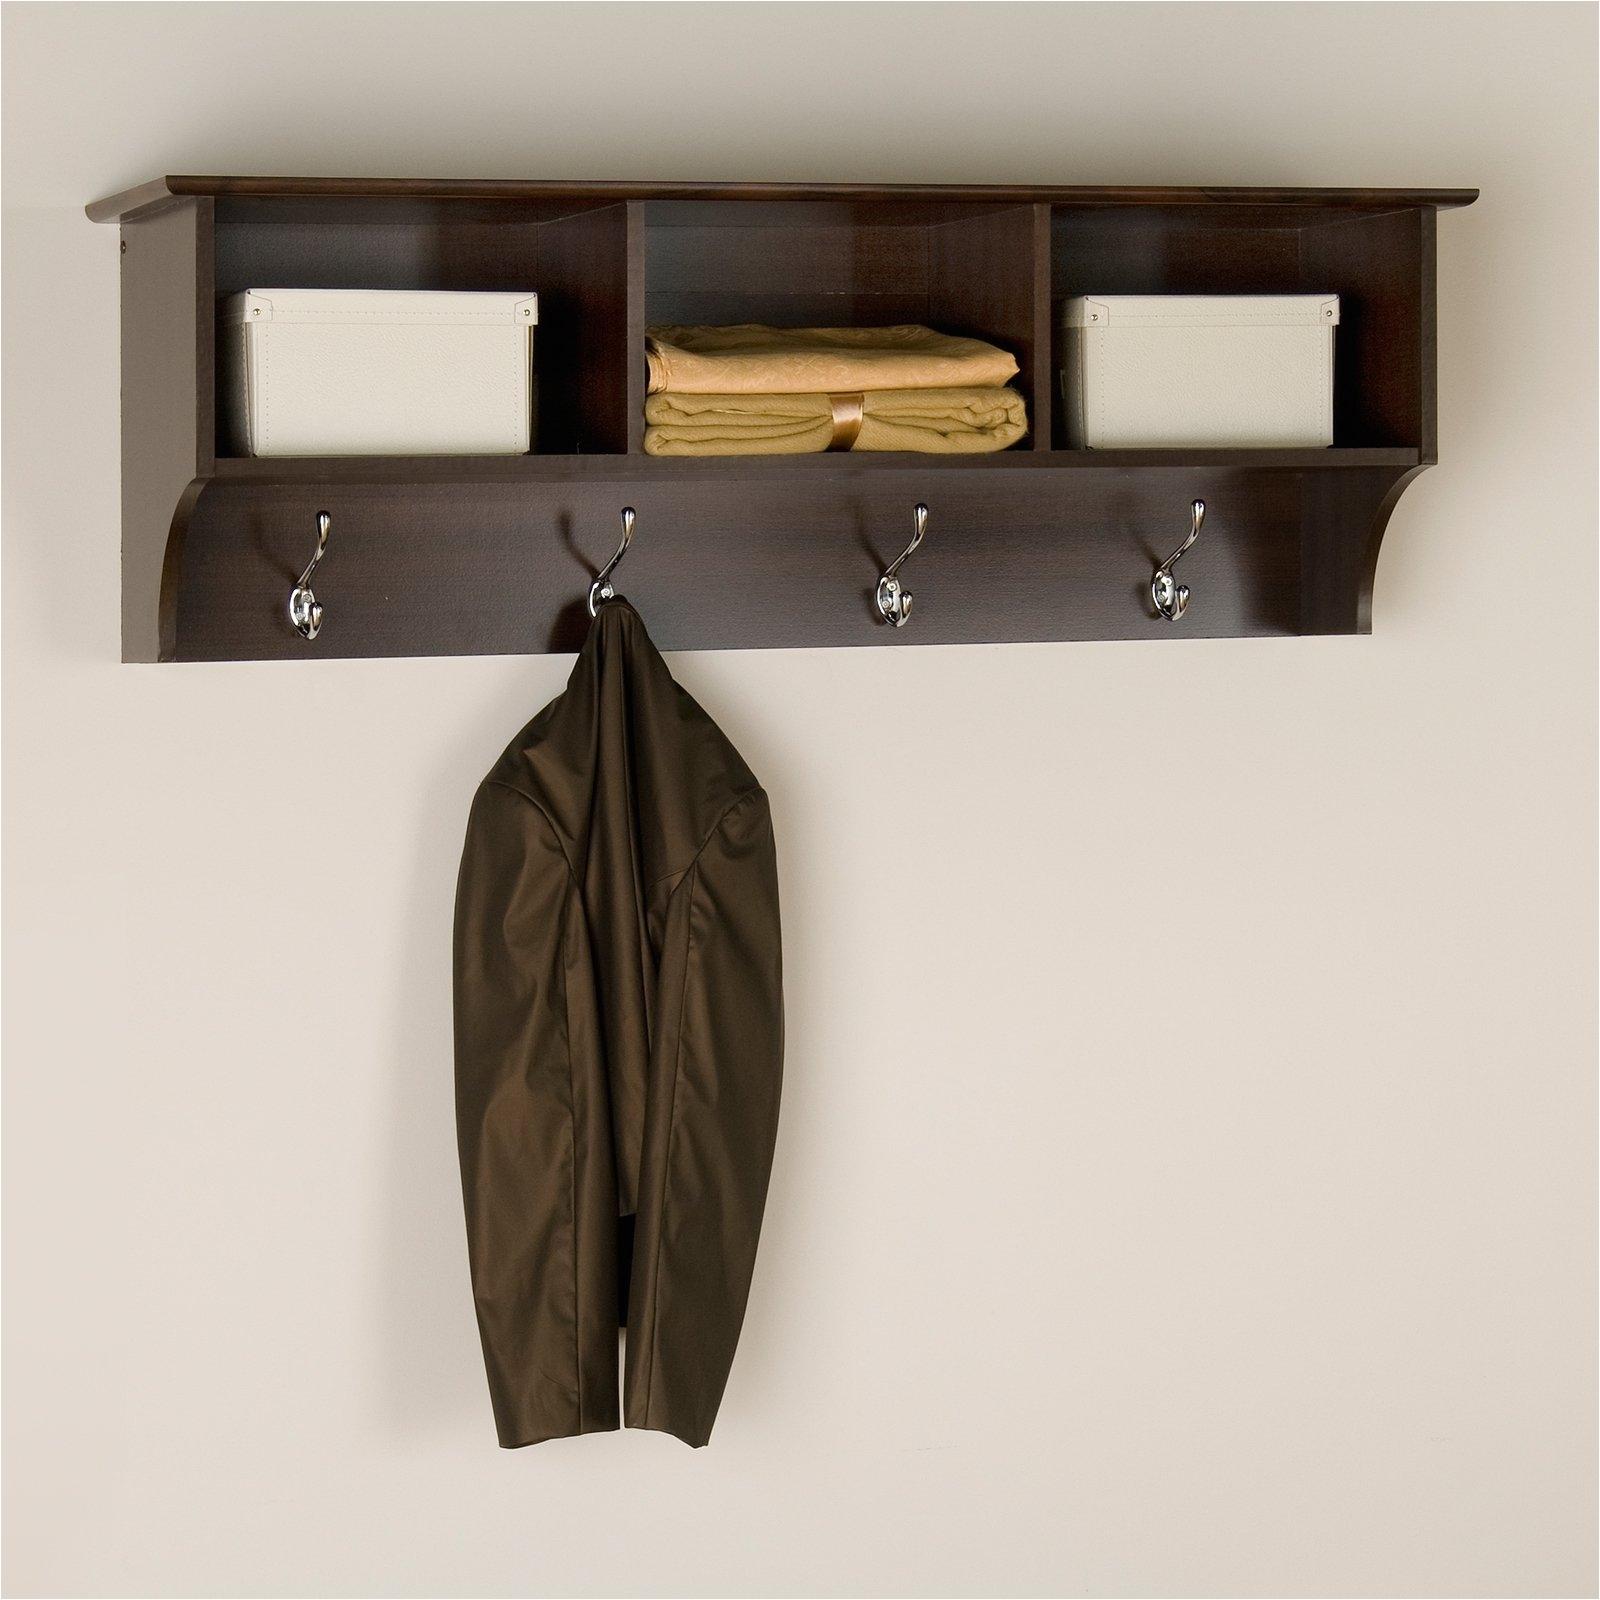 image of master entryway shelf with hooks